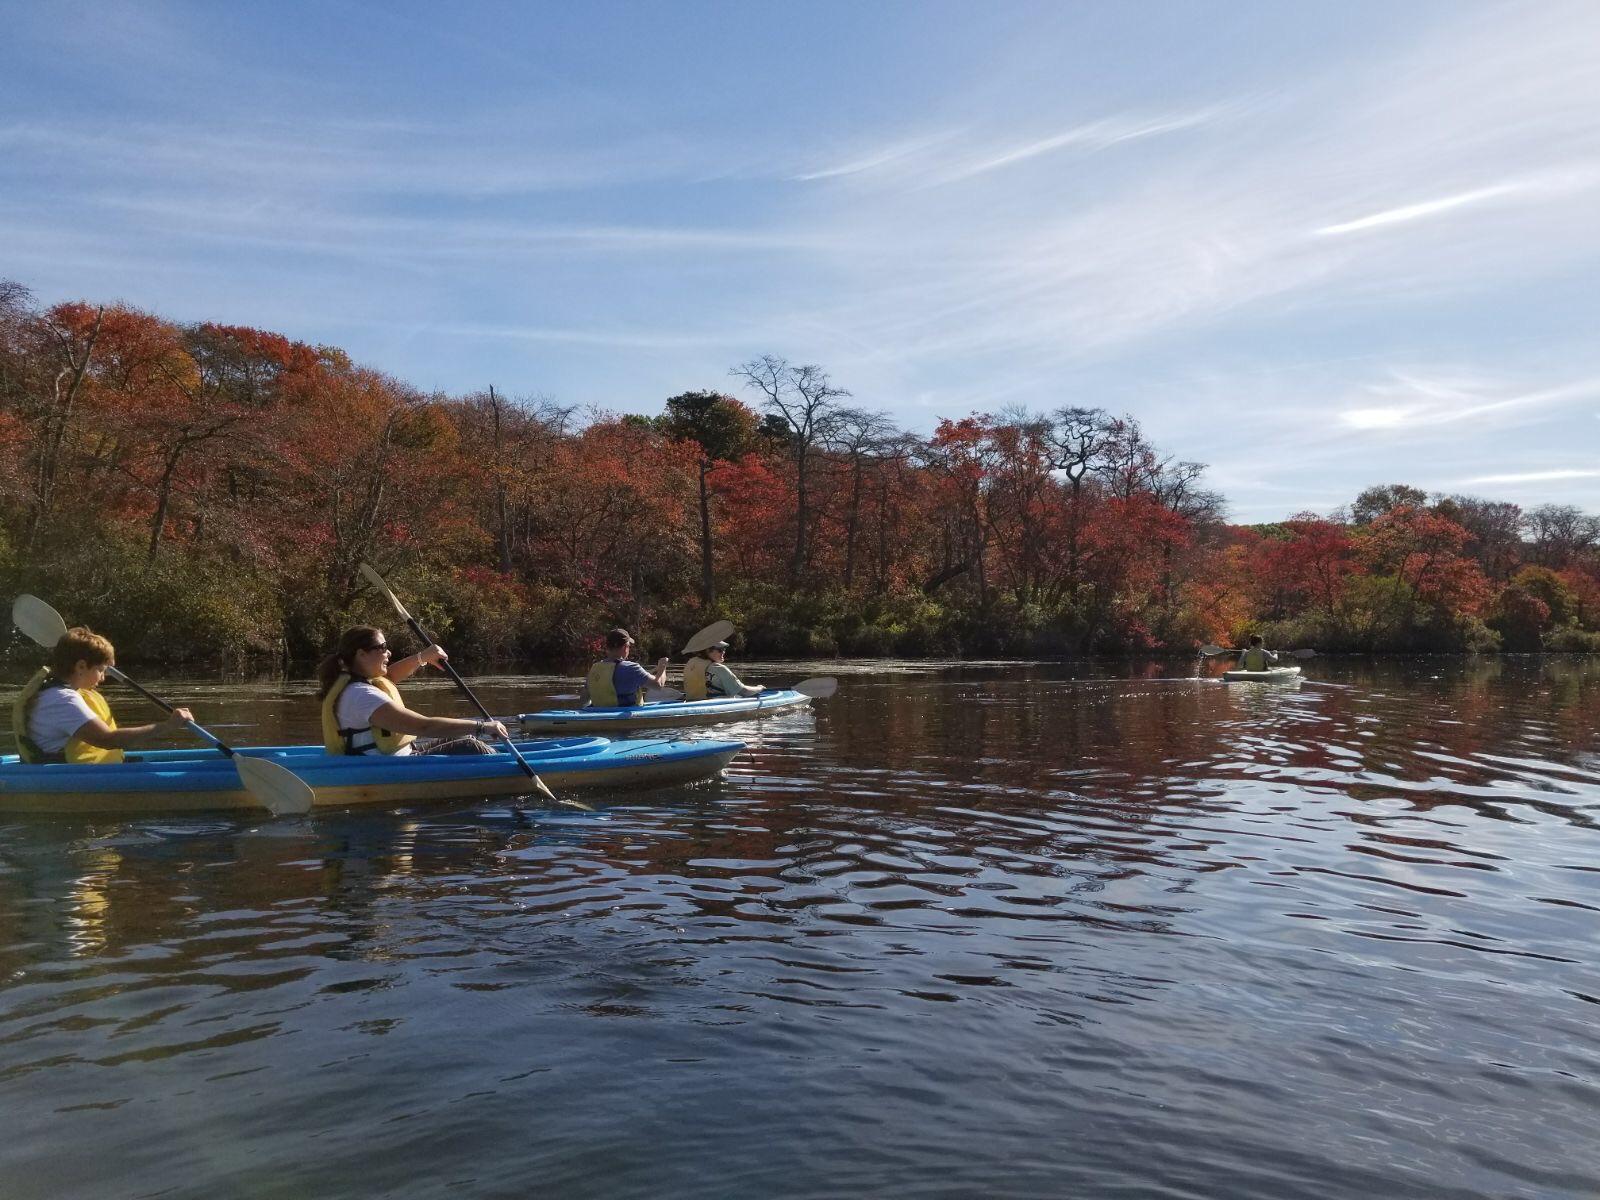 Paddling on Carman's River | Fall2017